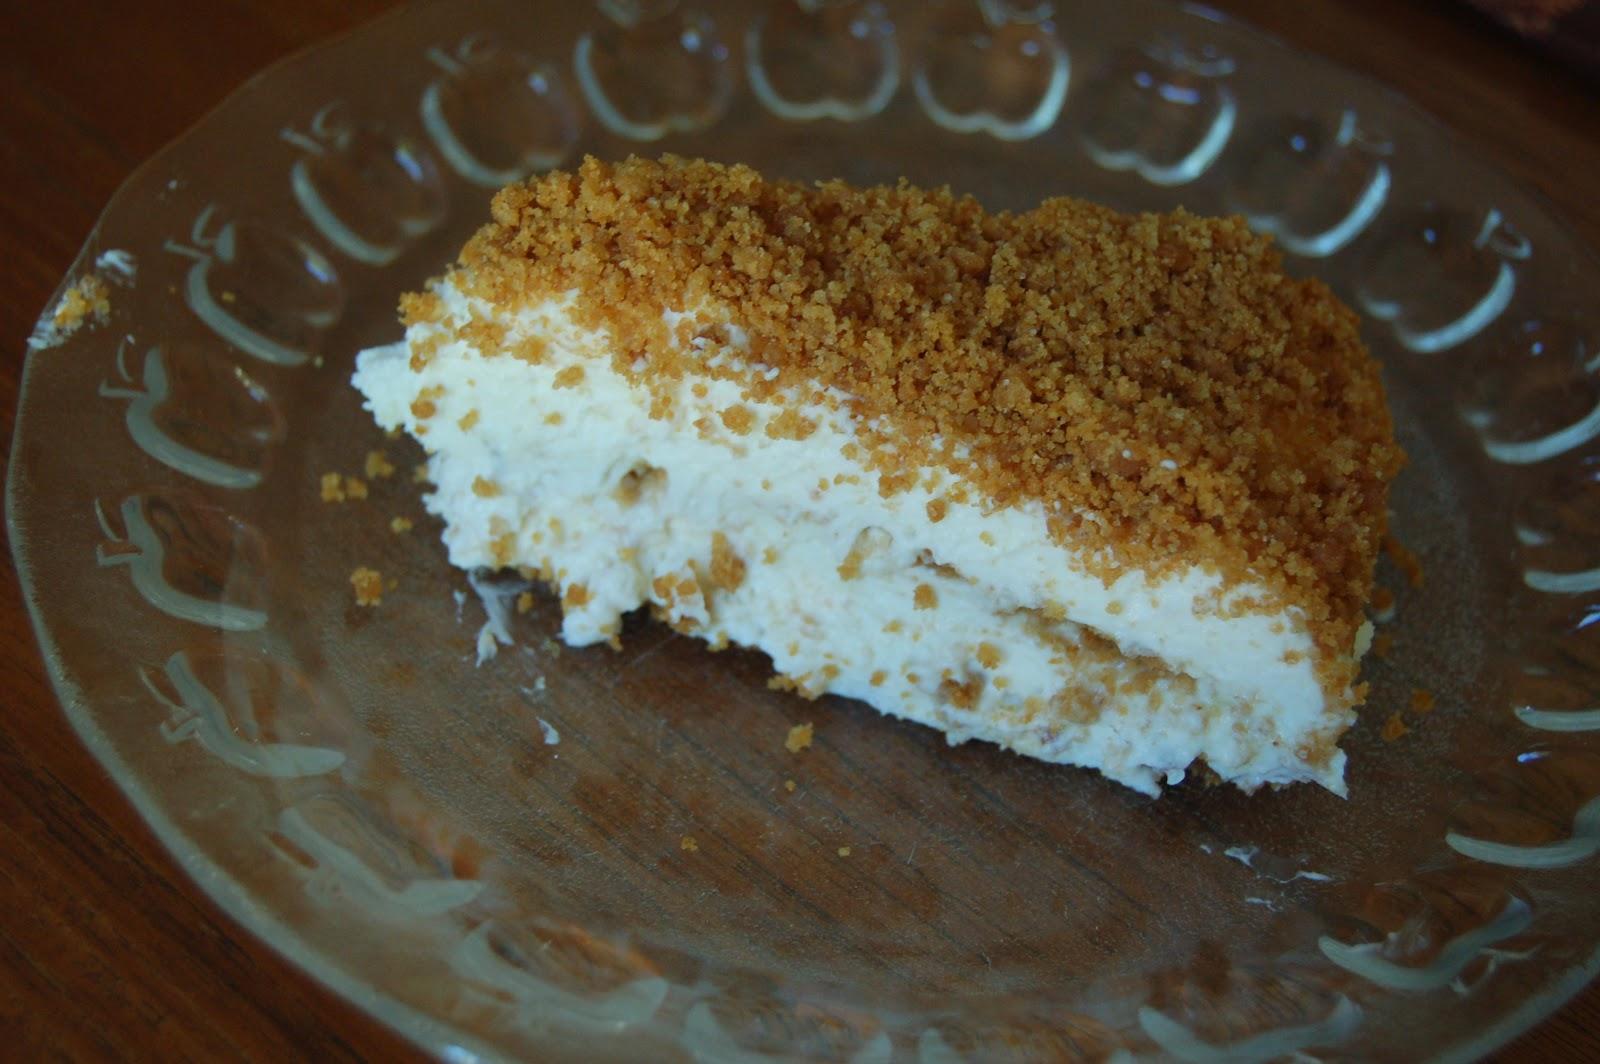 liebe: Ginger-Mascarpone Icebox Cake!